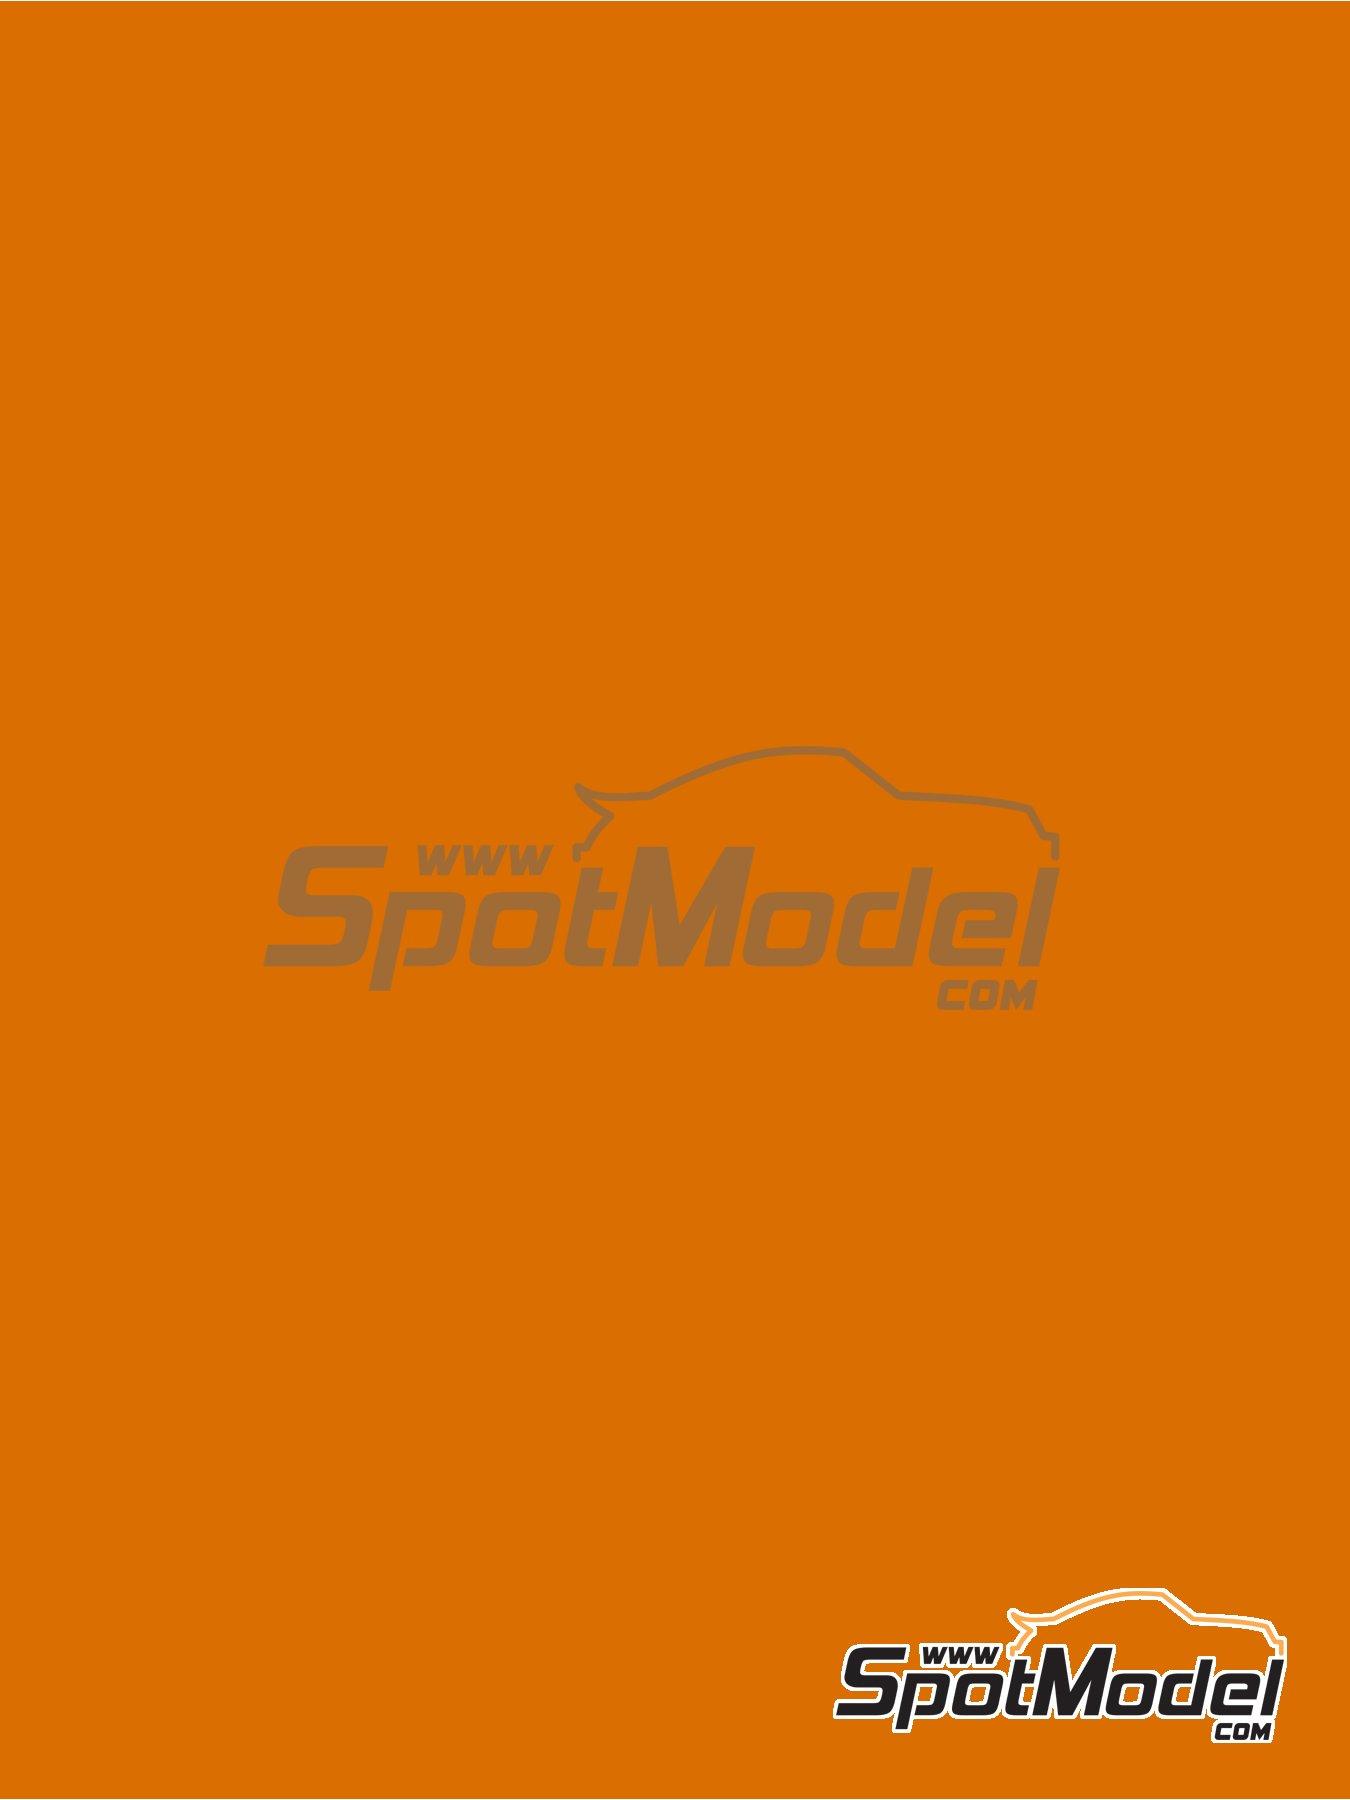 Amarillo naranja - RAL2000 - Yellow orange - 1 x 60ml | Pintura fabricado por Zero Paints (ref.ZP-1033-RAL2000) image